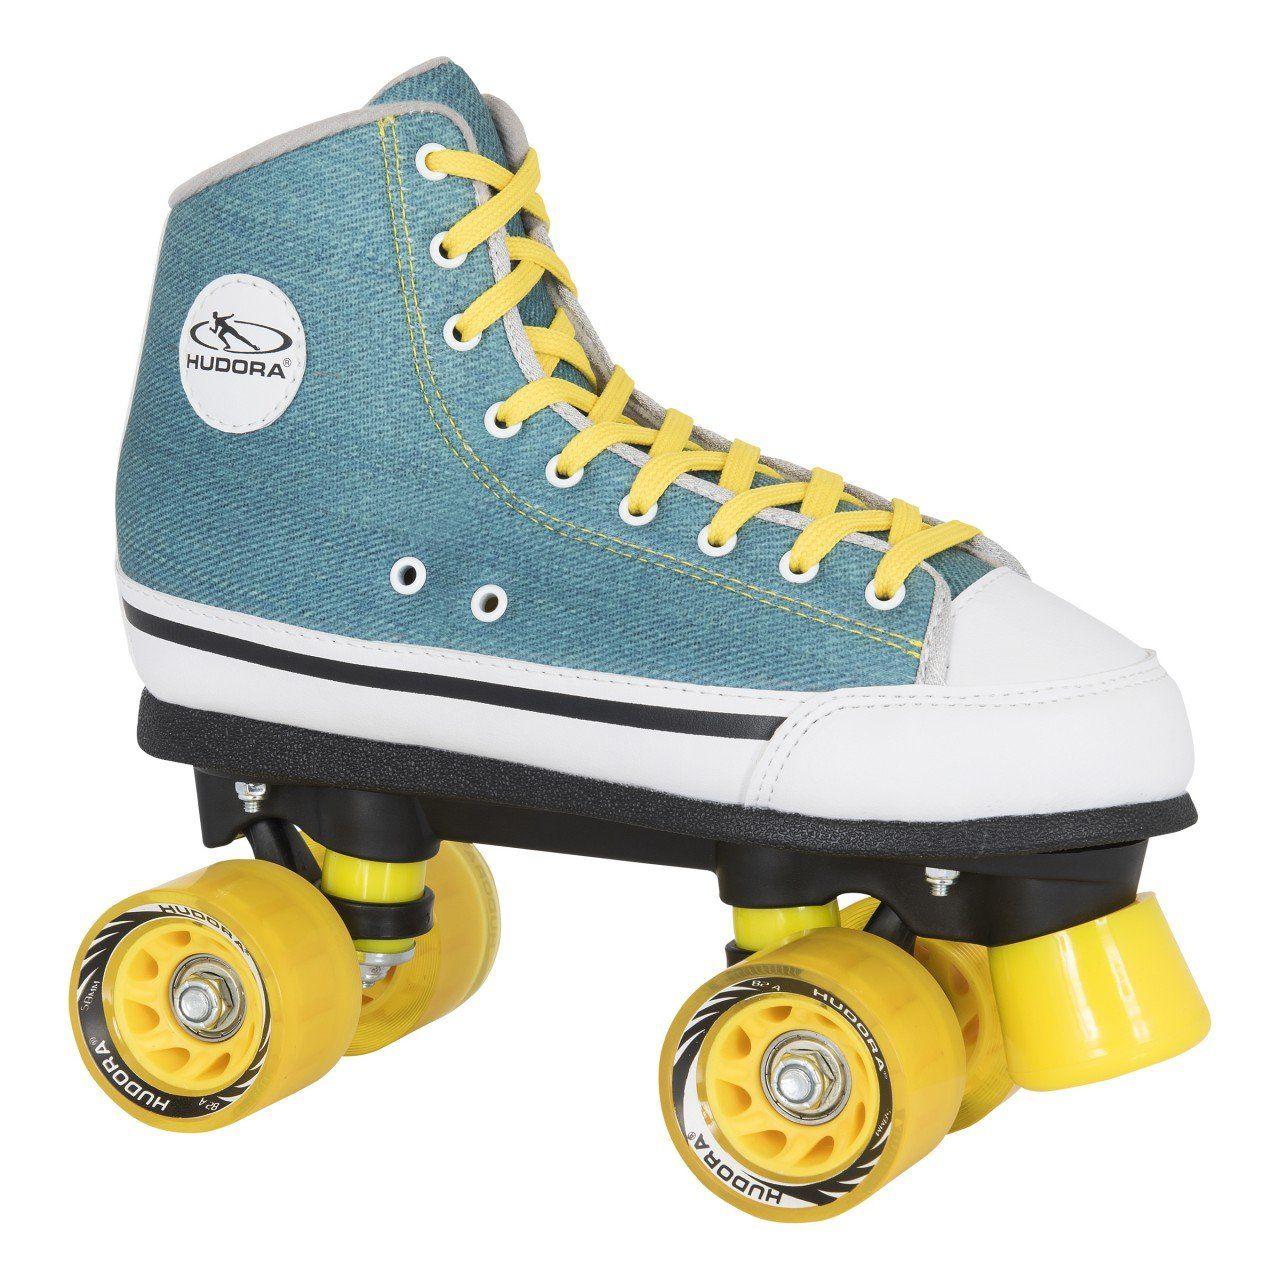 def3e2e6386 Der Spielzeugtester hat das HUDORA Rollschuhe Roller-Skates Green Denim,  Disco-Roller,